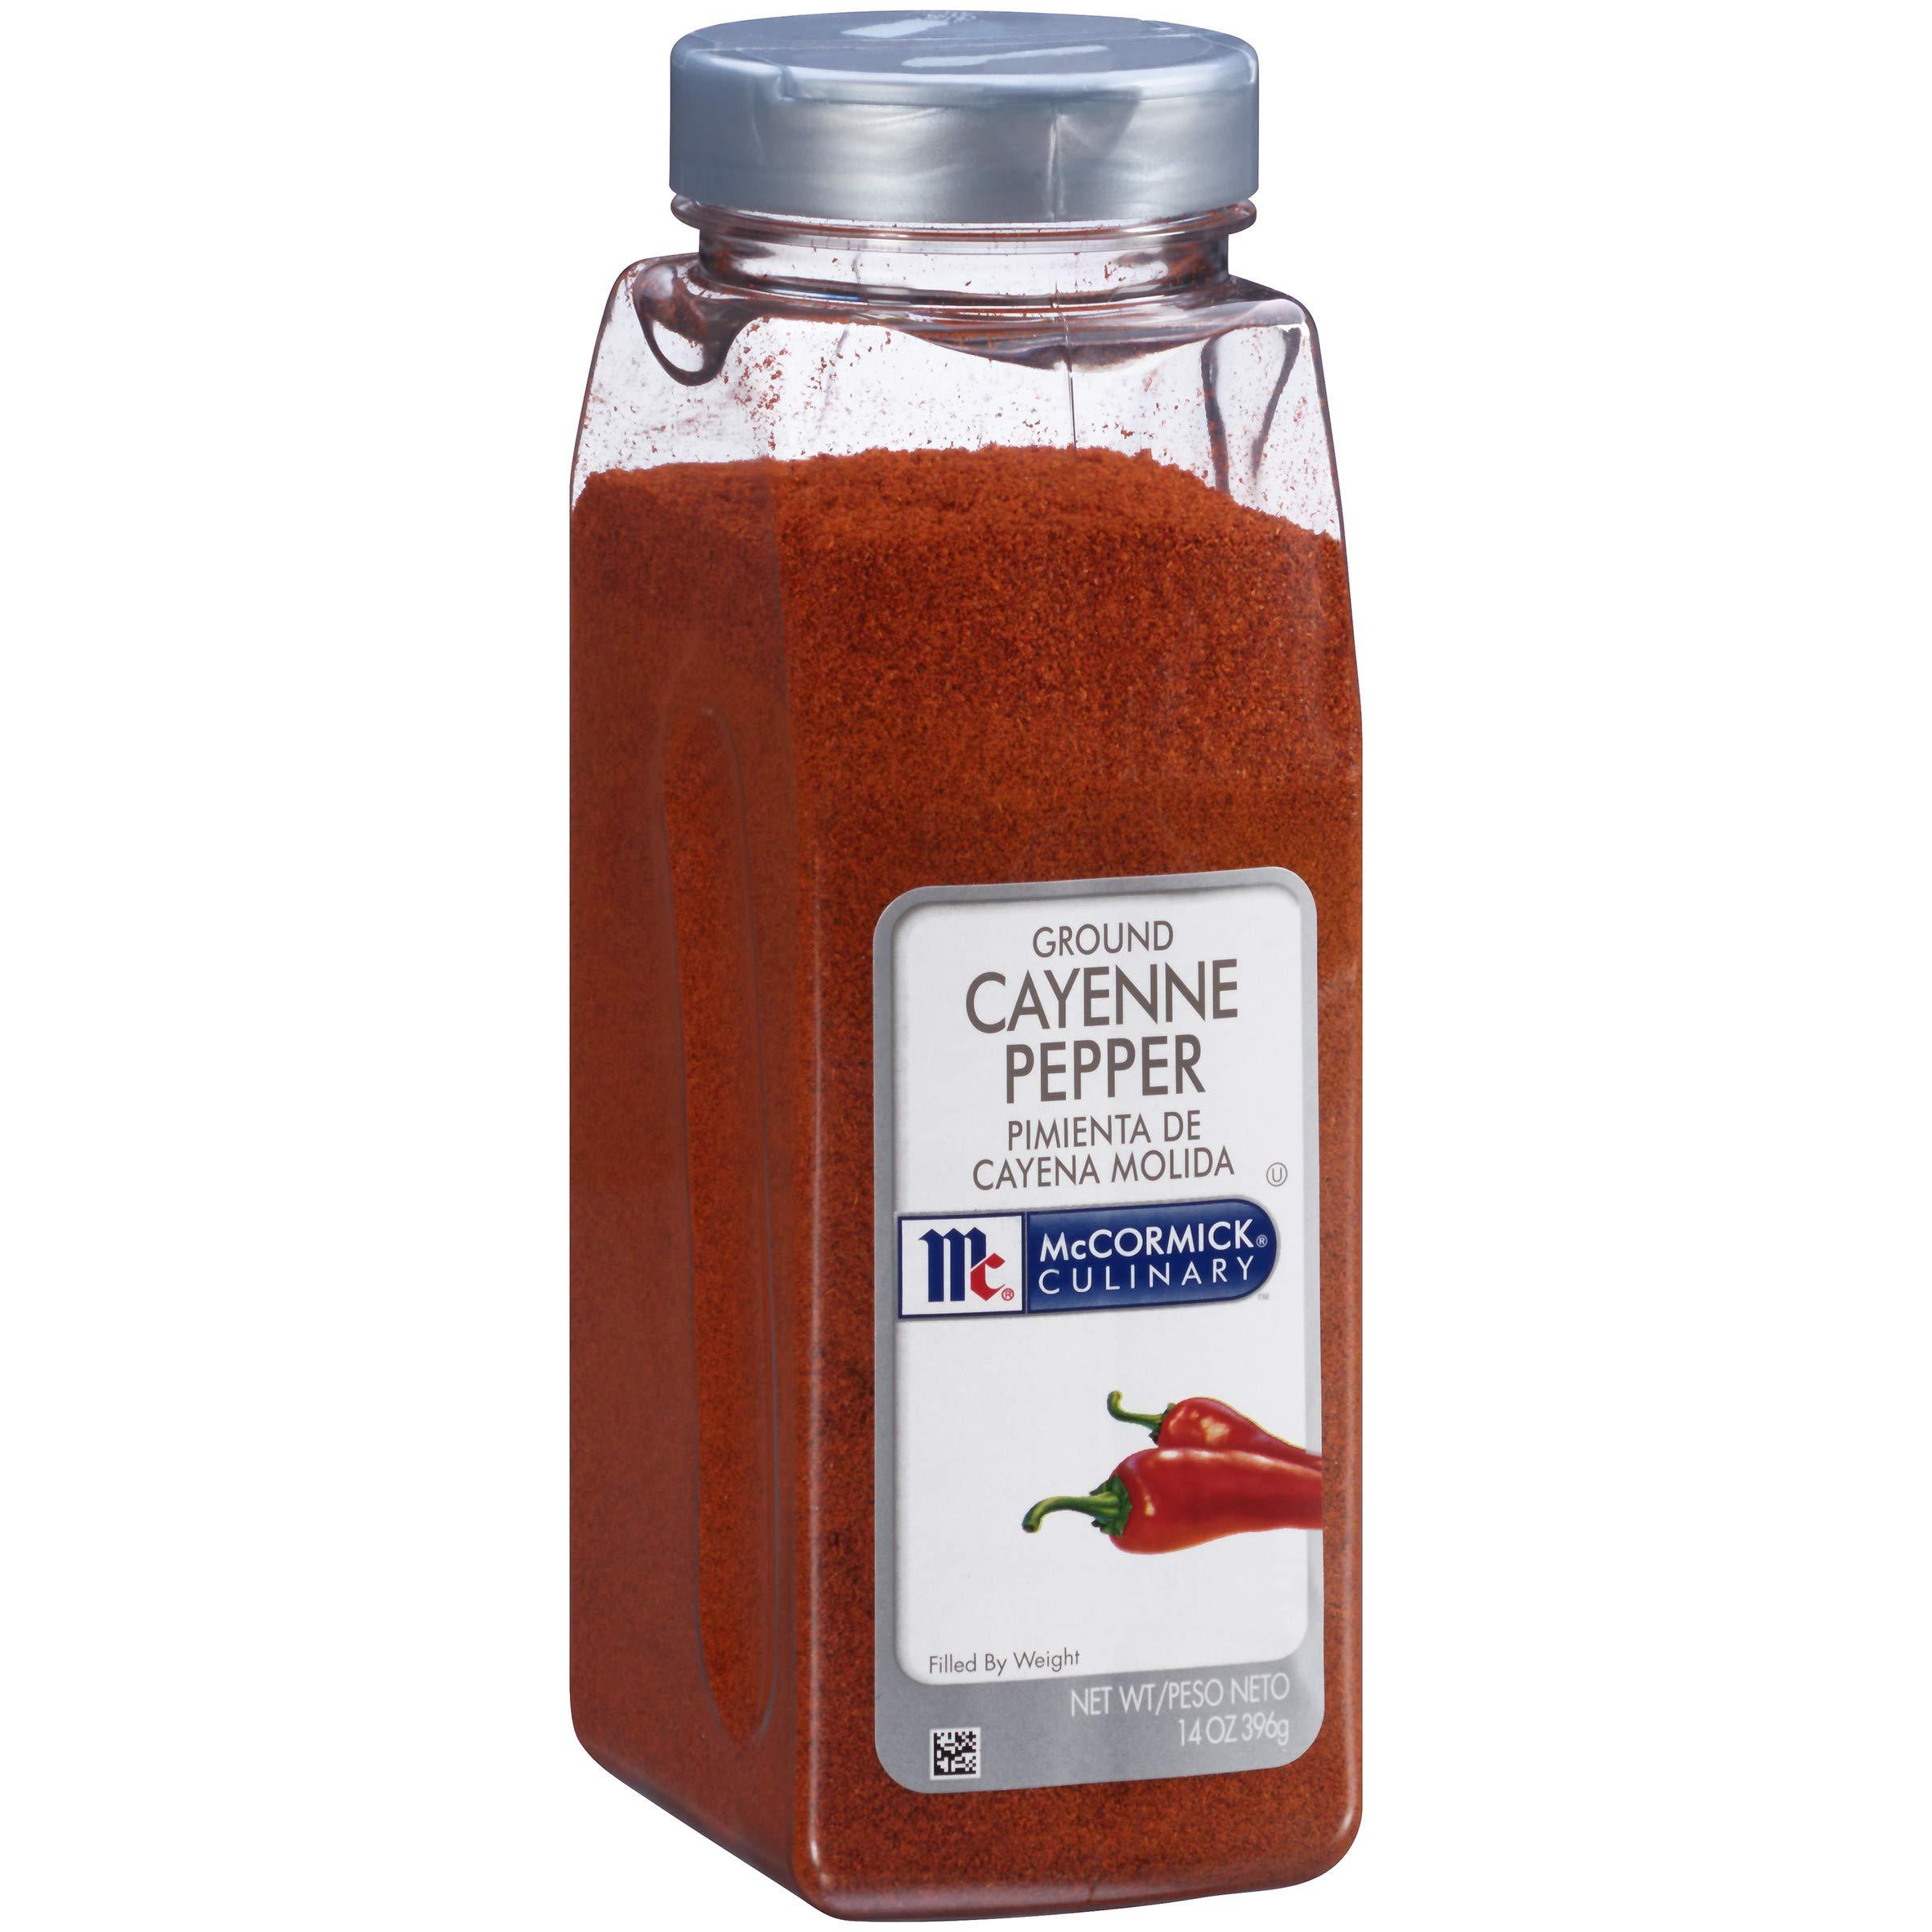 McCormick Culinary Ground Cayenne Pepper, 14 oz